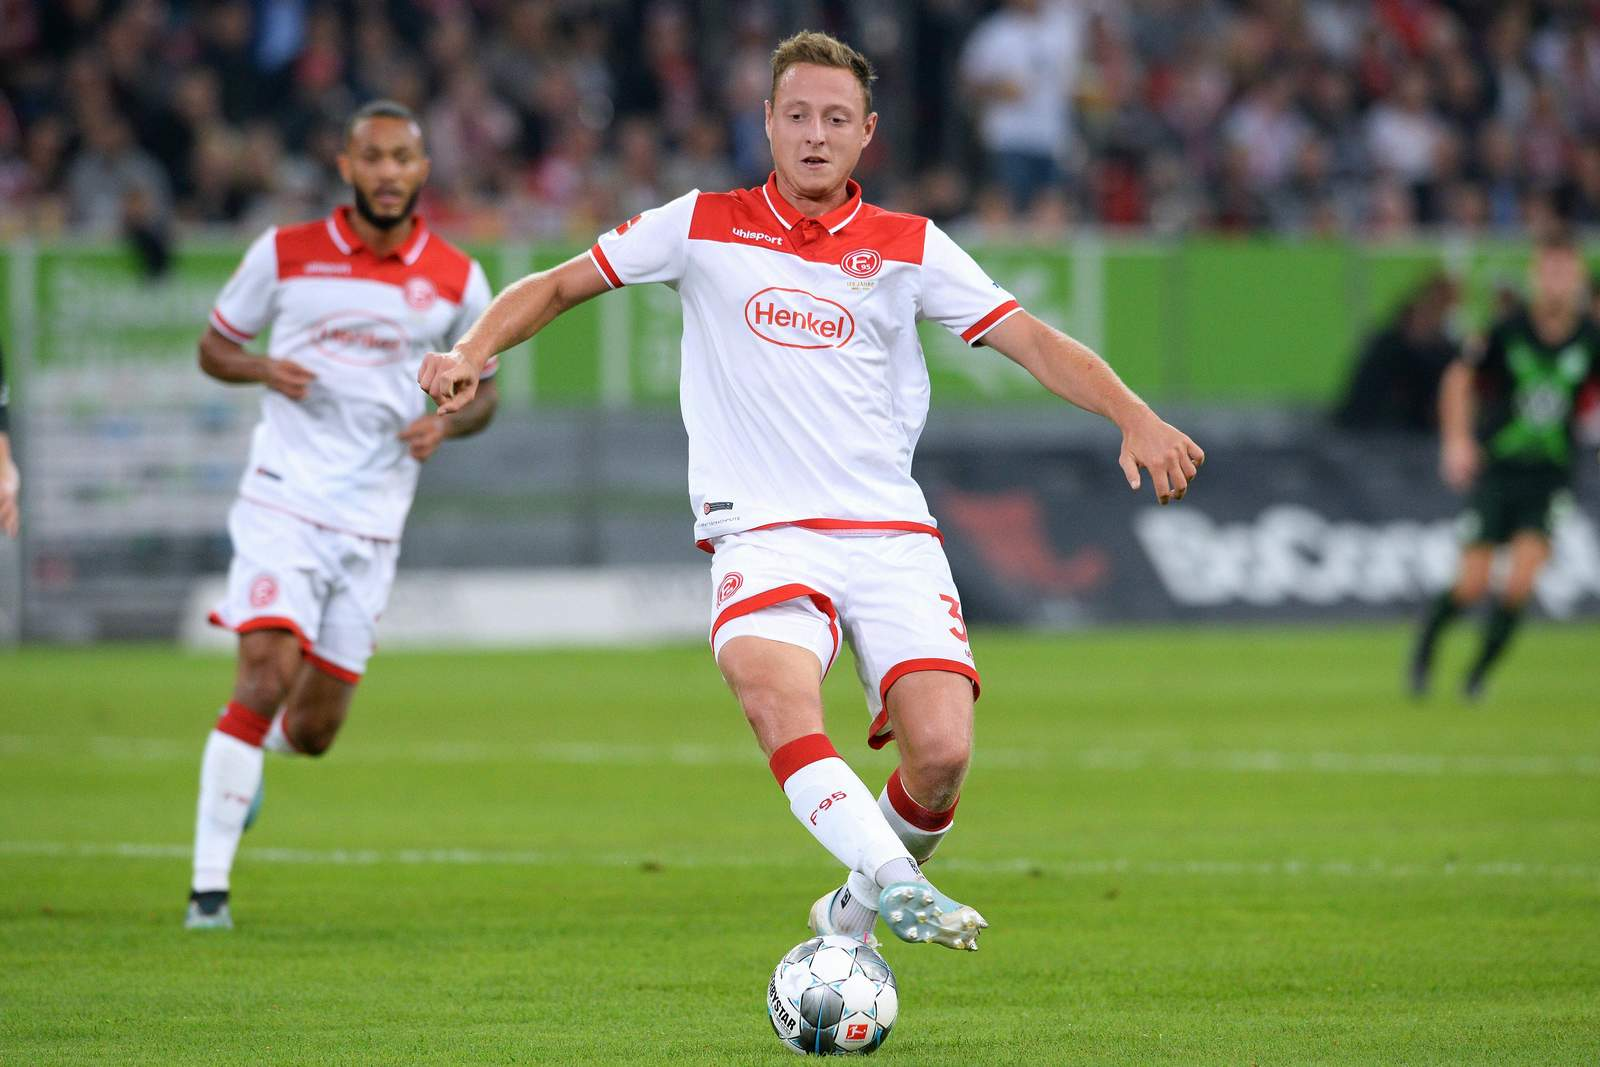 Robin Bormuth bei Fortuna Düsseldorf